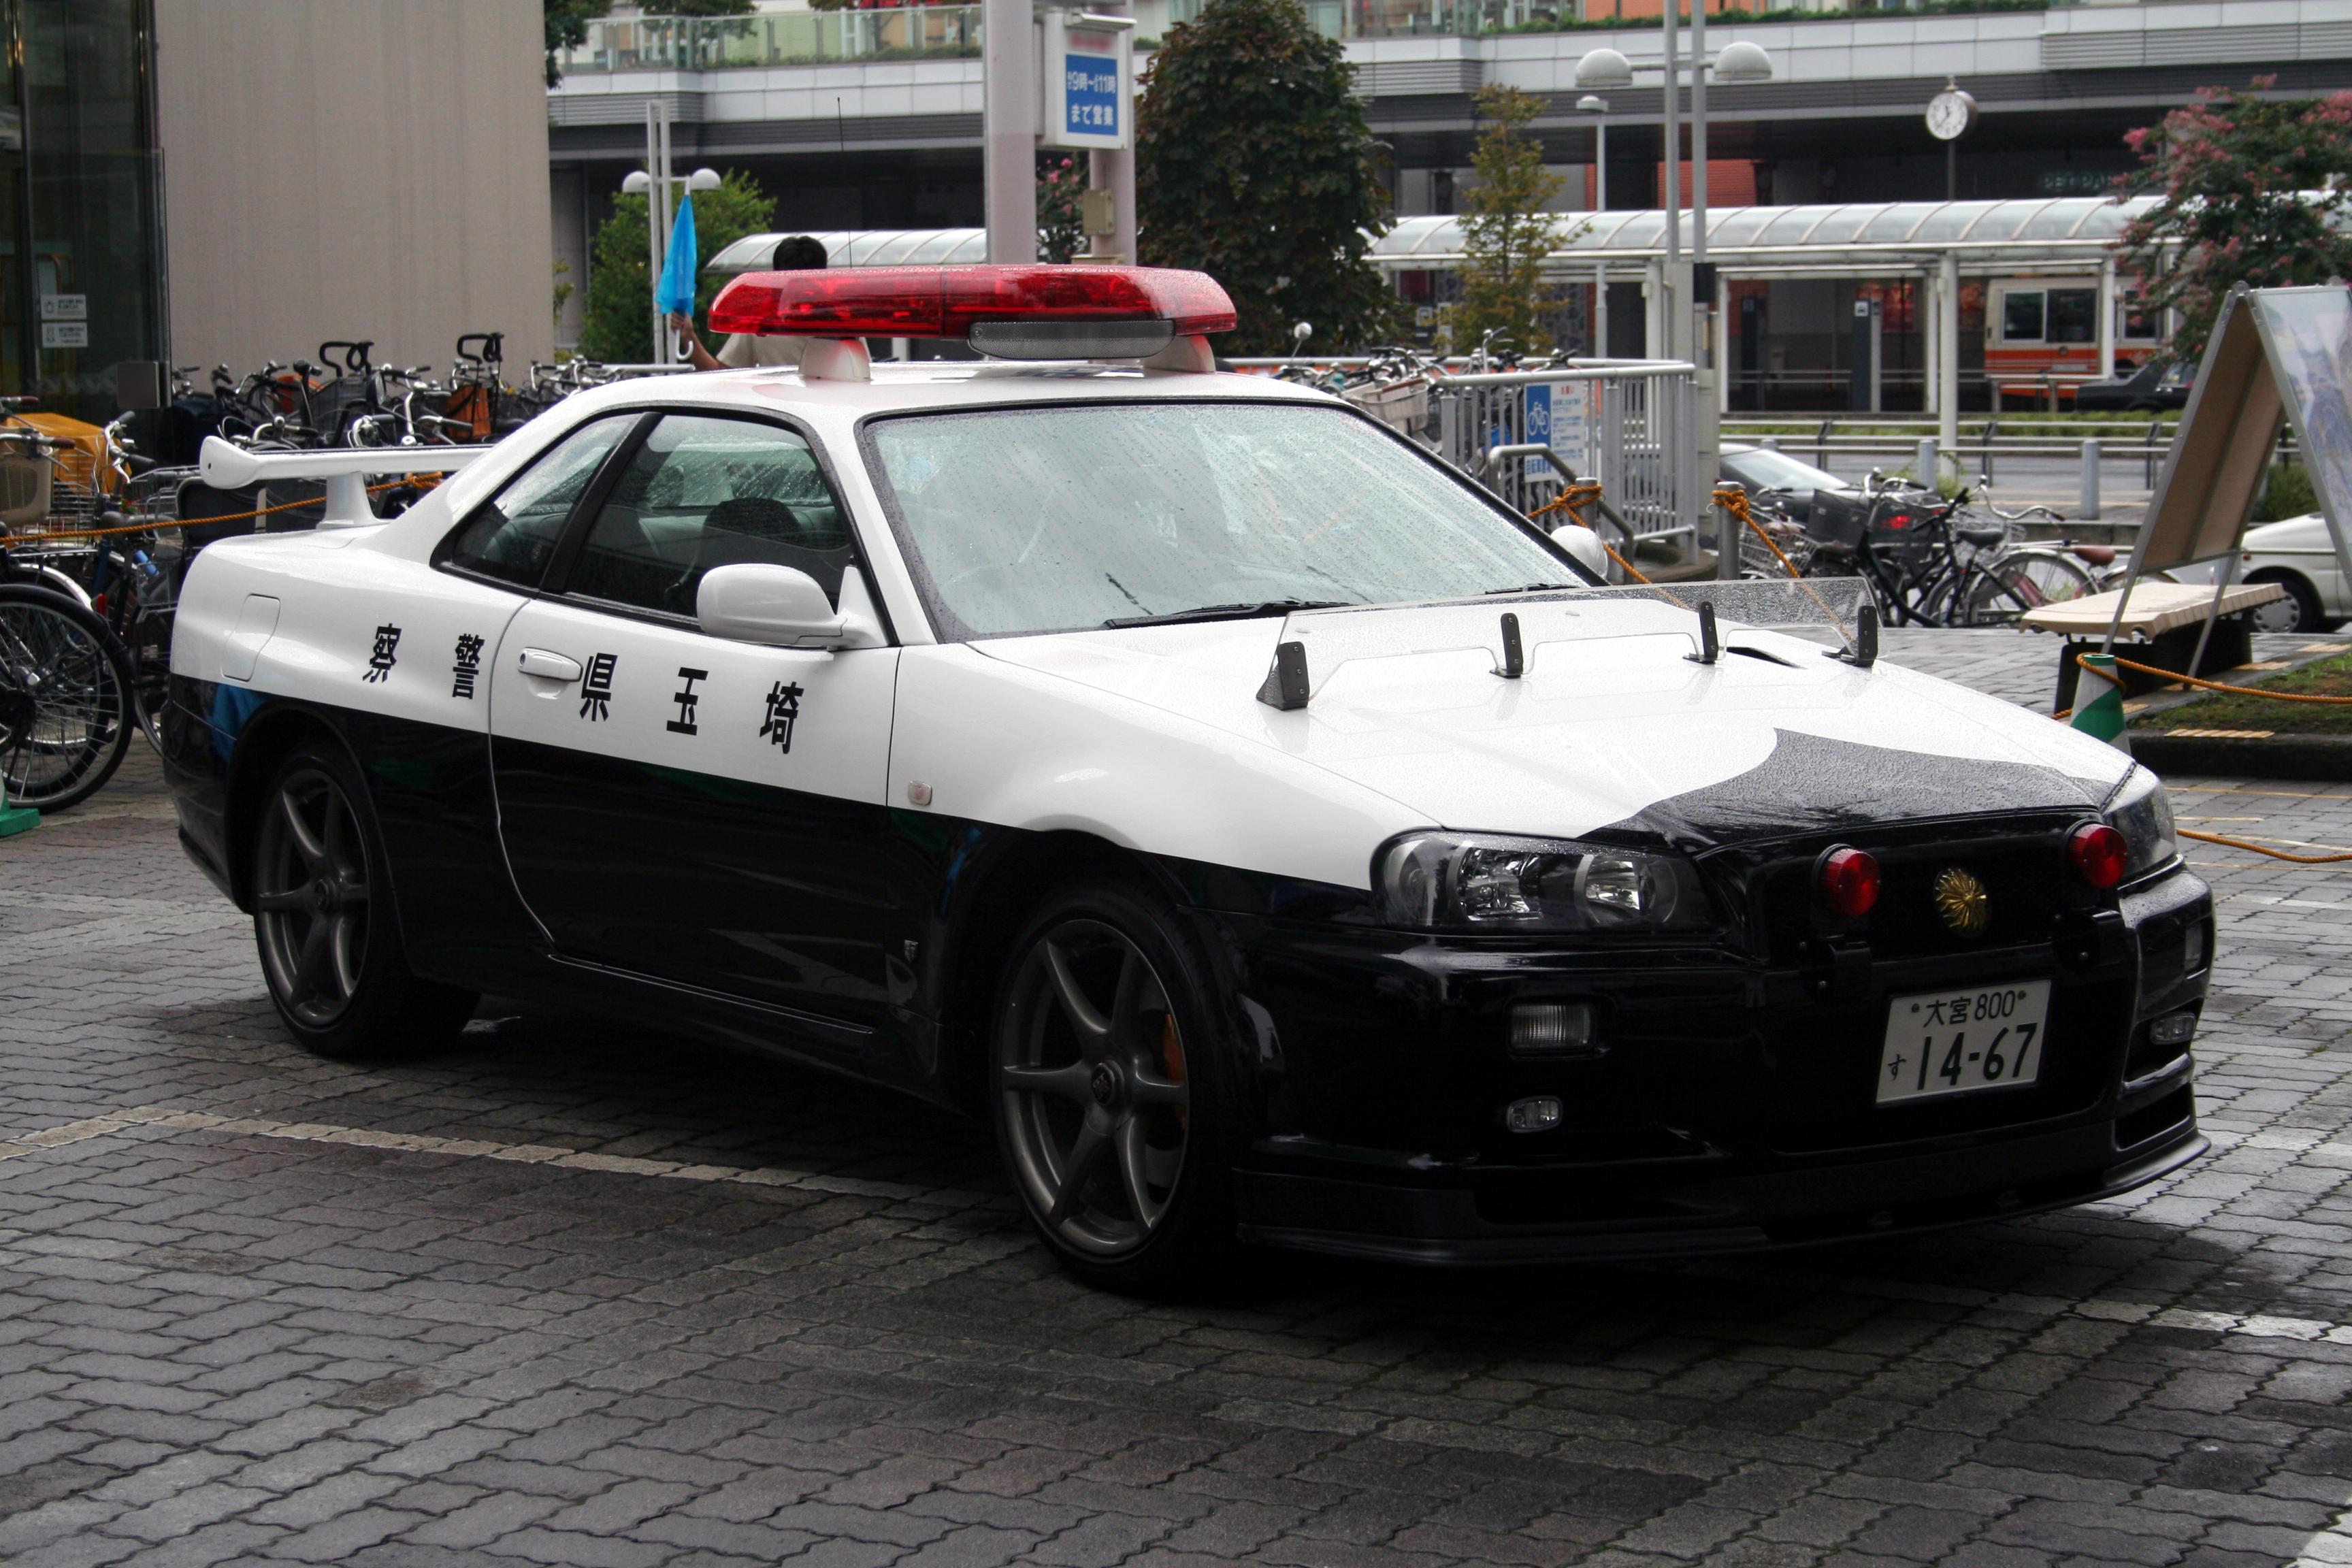 Japanese_NISSAN_SkylineR34_GTR_police_ca